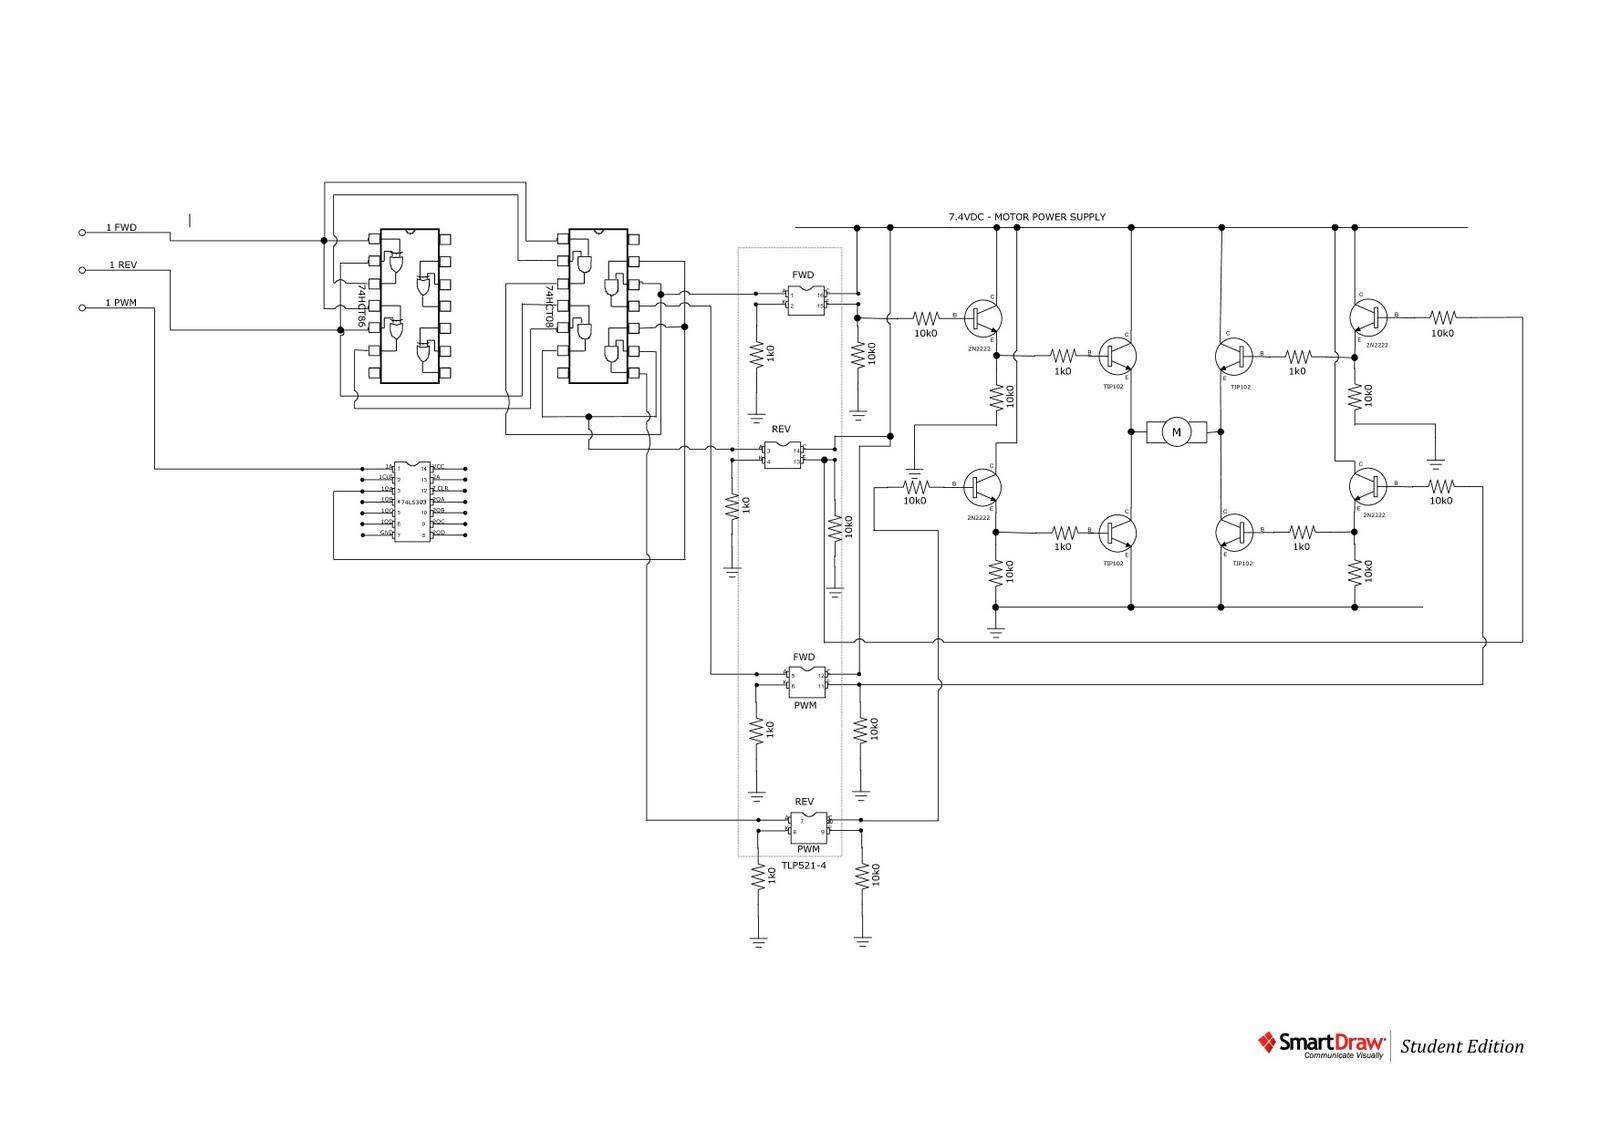 Usb Flash Drive Wiring Diagram Library Reversecamerawiringdiagramjpg Circuit And Ordering